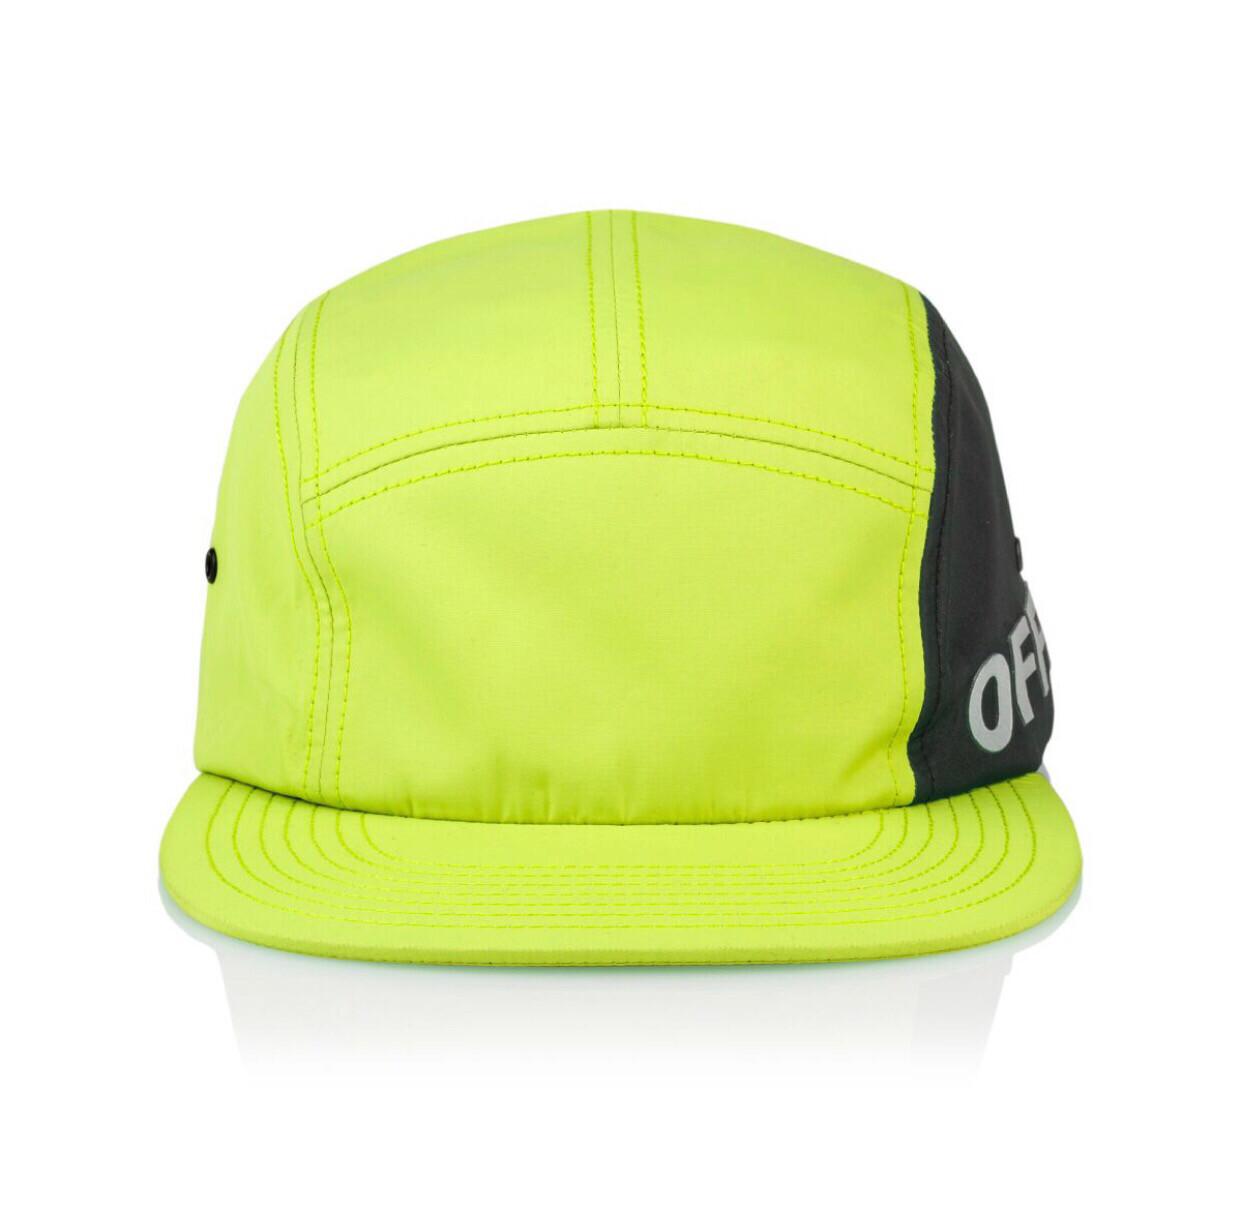 Official Neon Cap